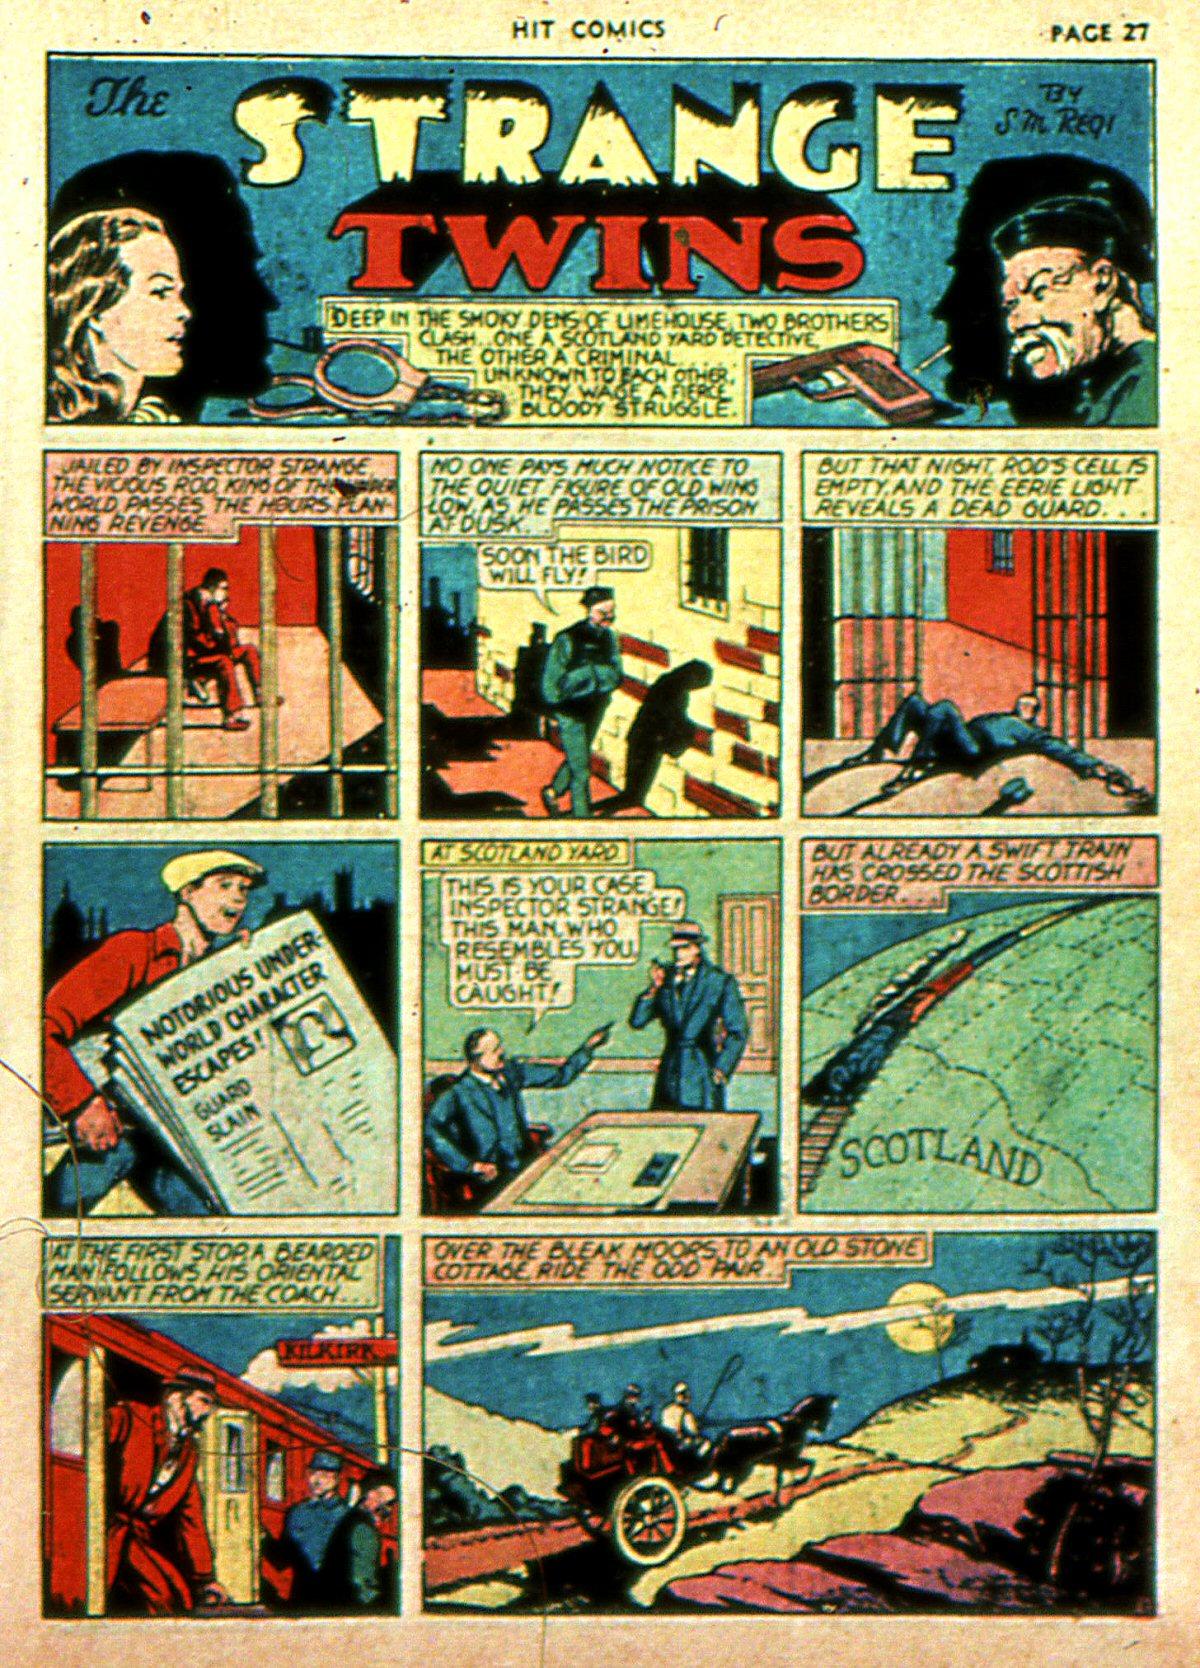 Read online Hit Comics comic -  Issue #2 - 29